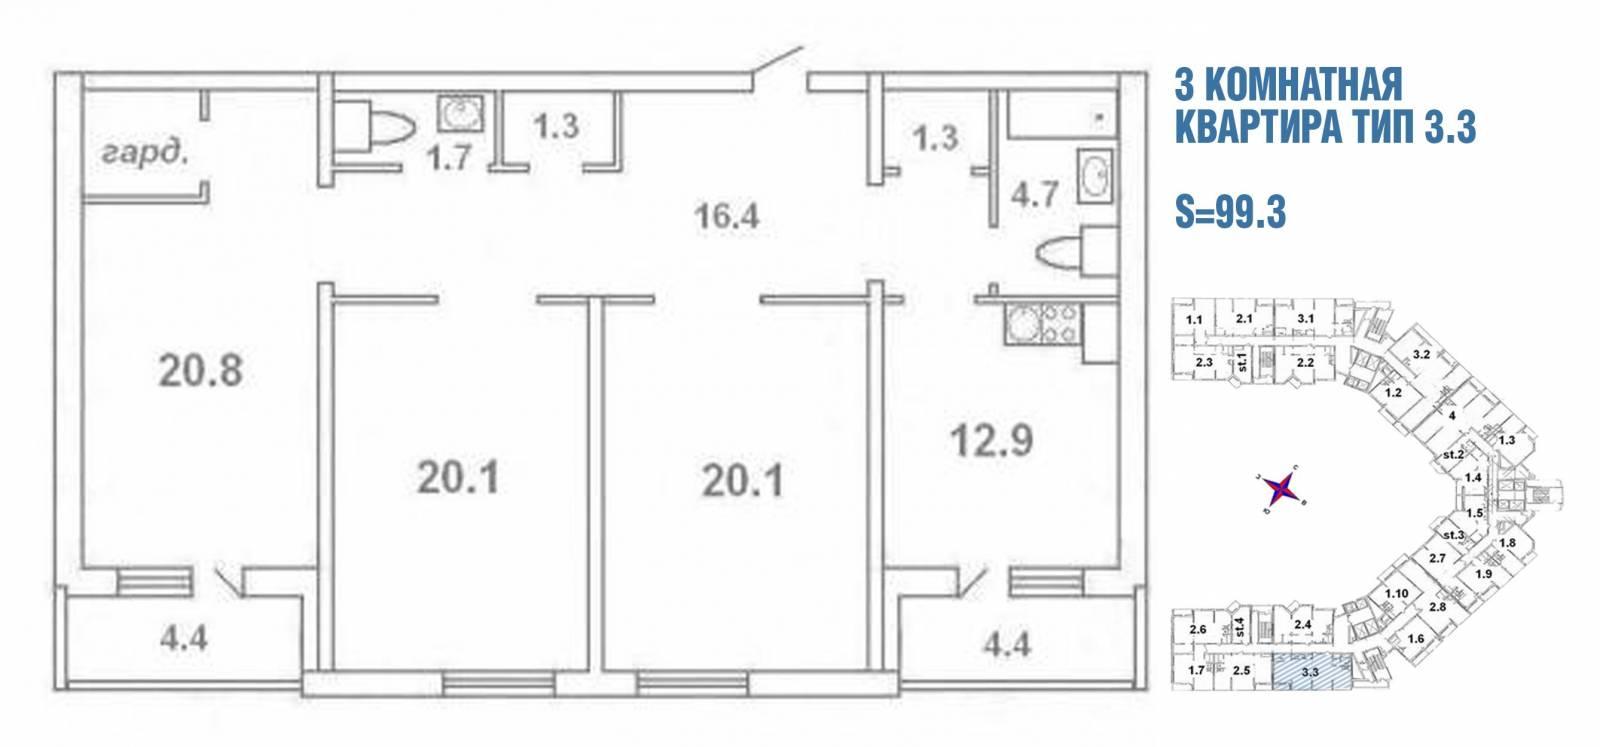 3-х комнатная квартира тип 3.3 - 99,3 кв.м.